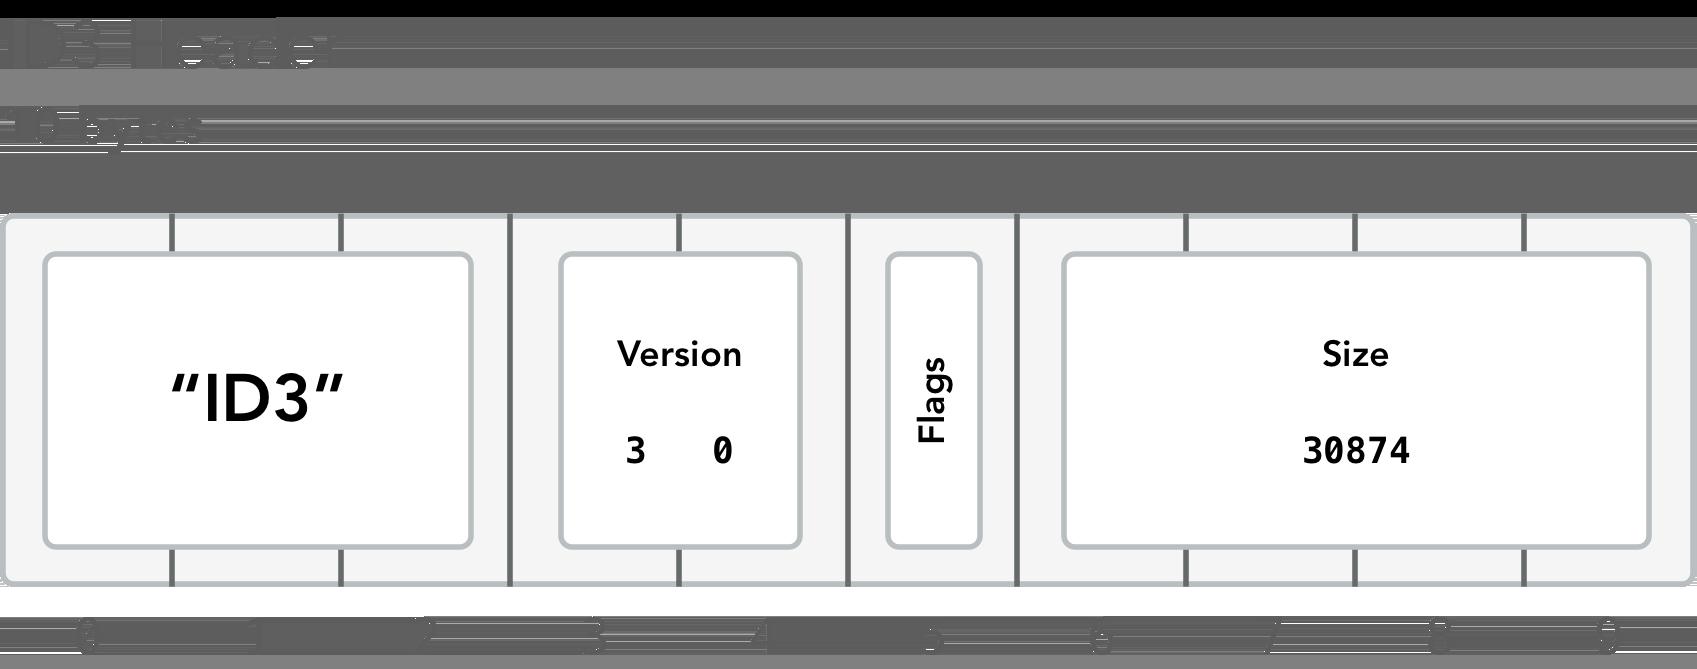 Layout of ID3 metadata